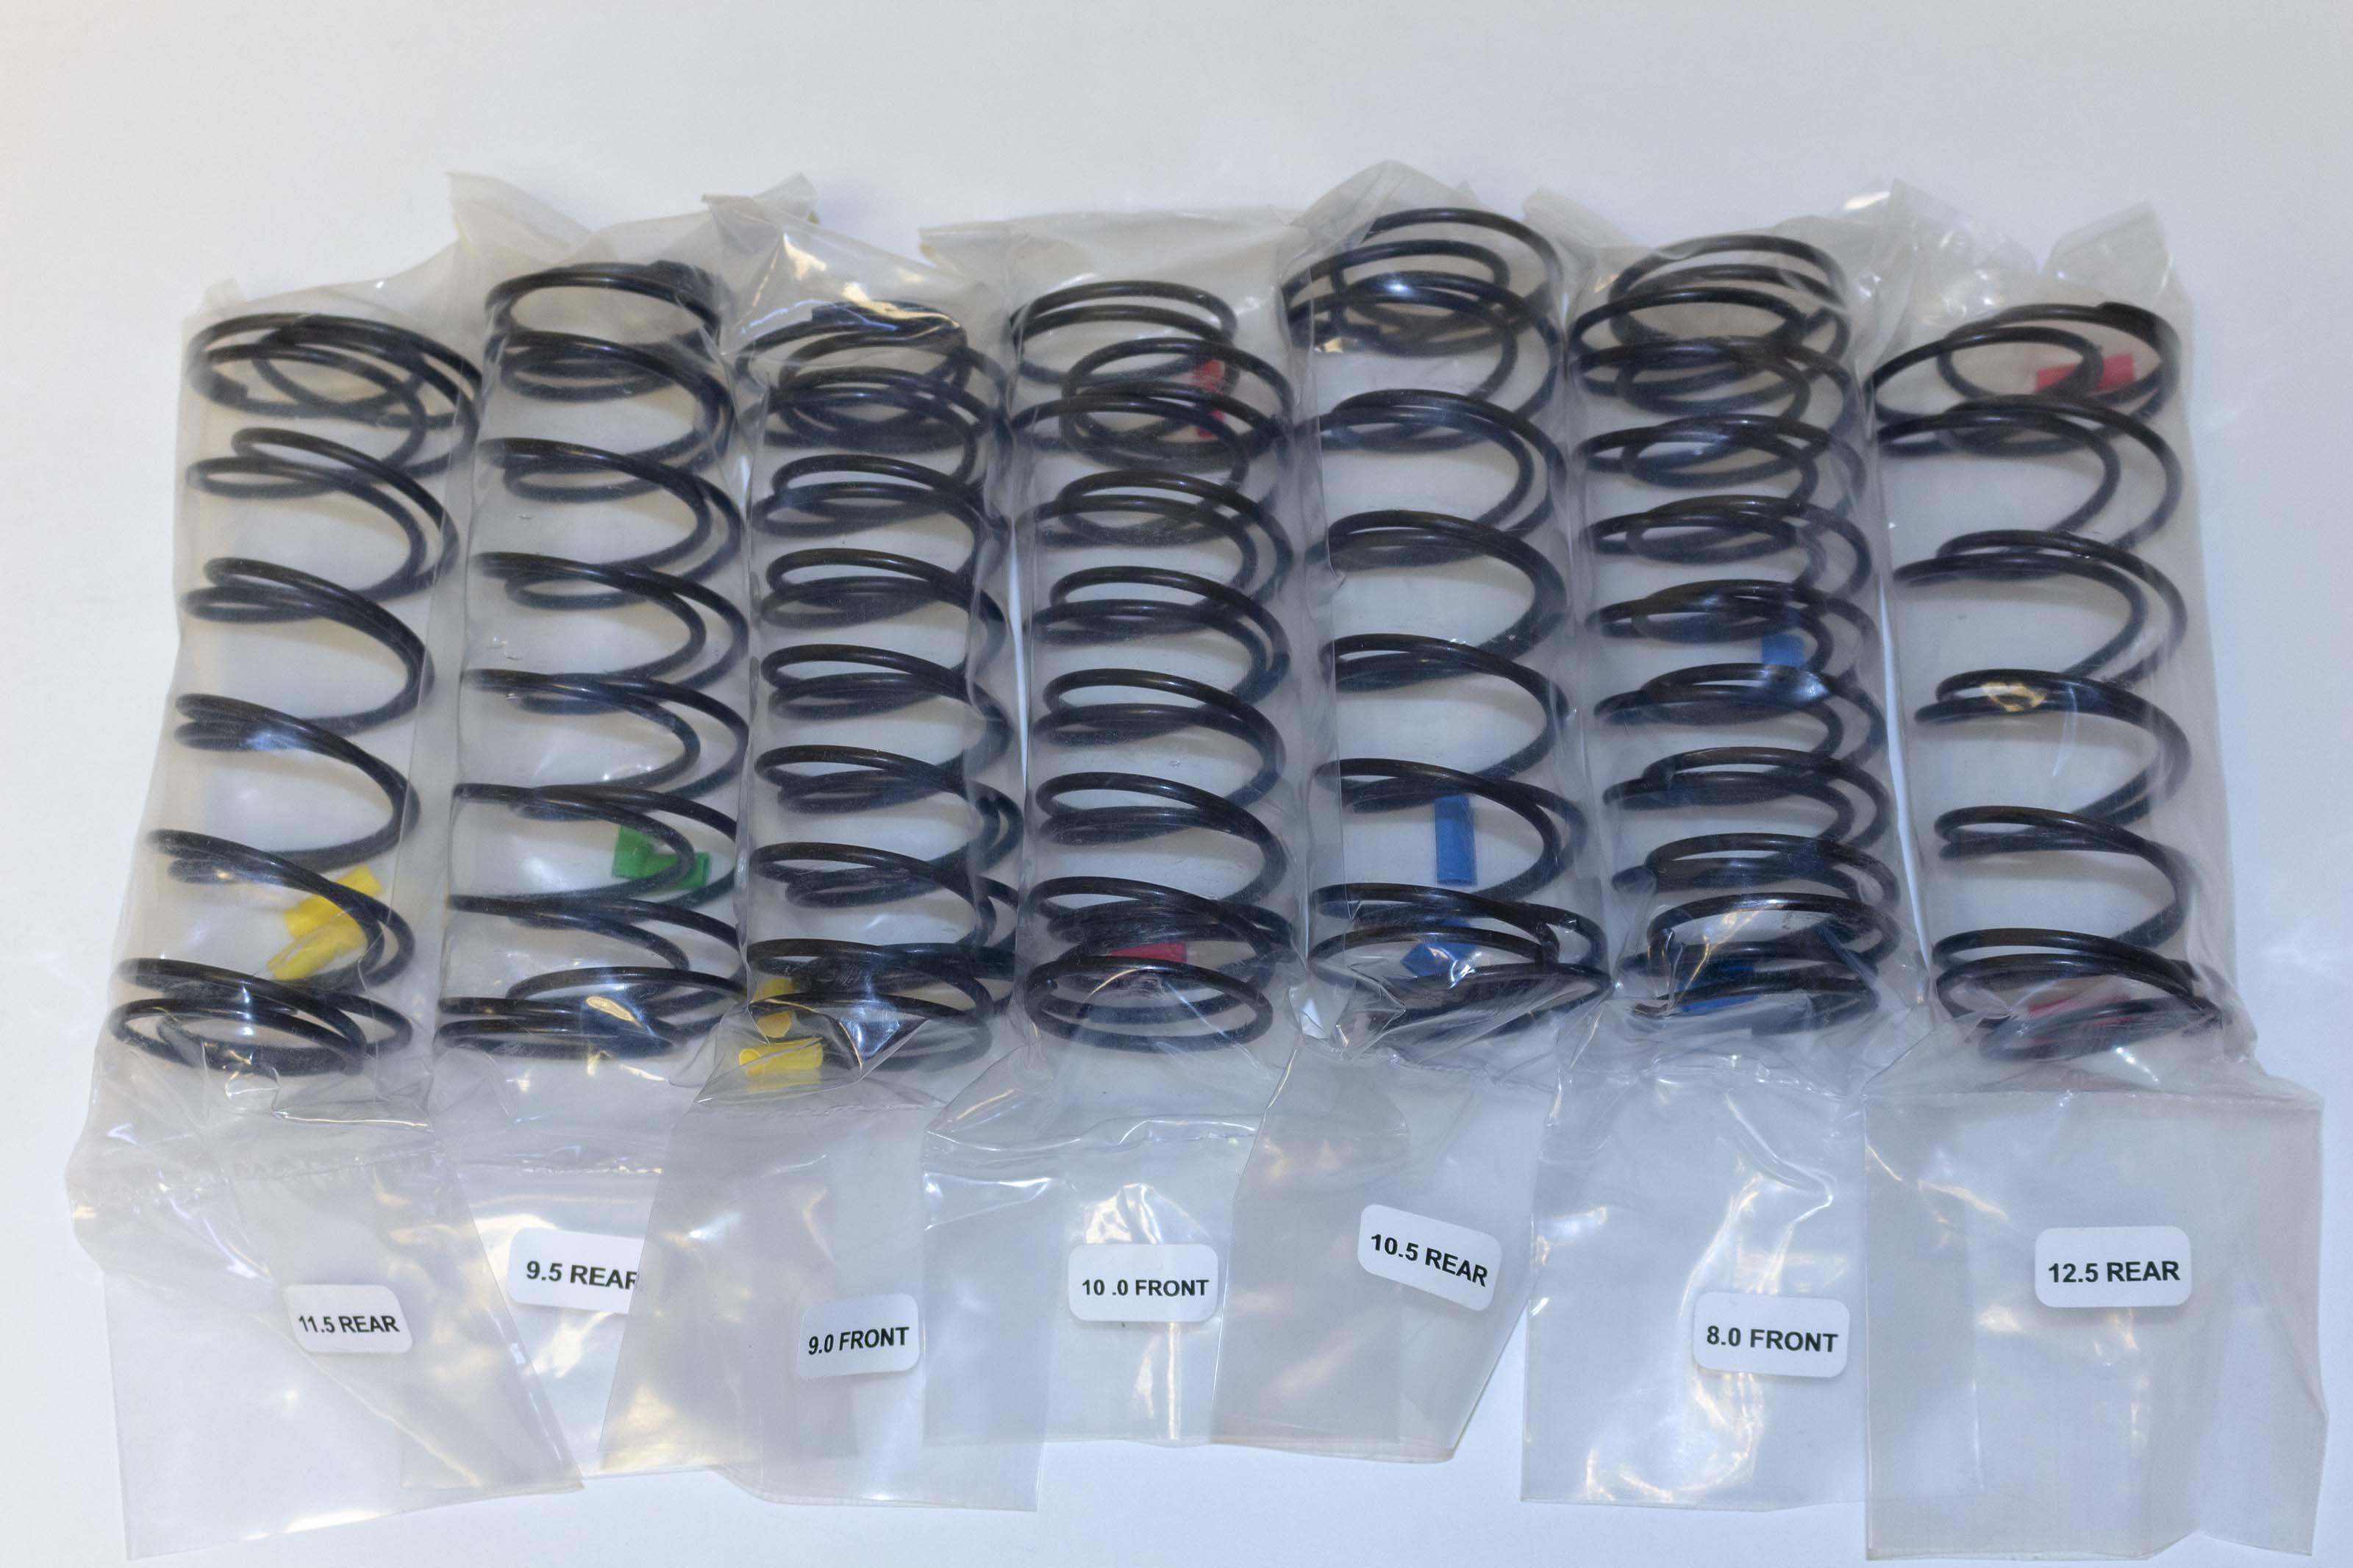 MINI WRC : 5IVE-T LOSB2855 4 Losi Shock Plastics /& Balls